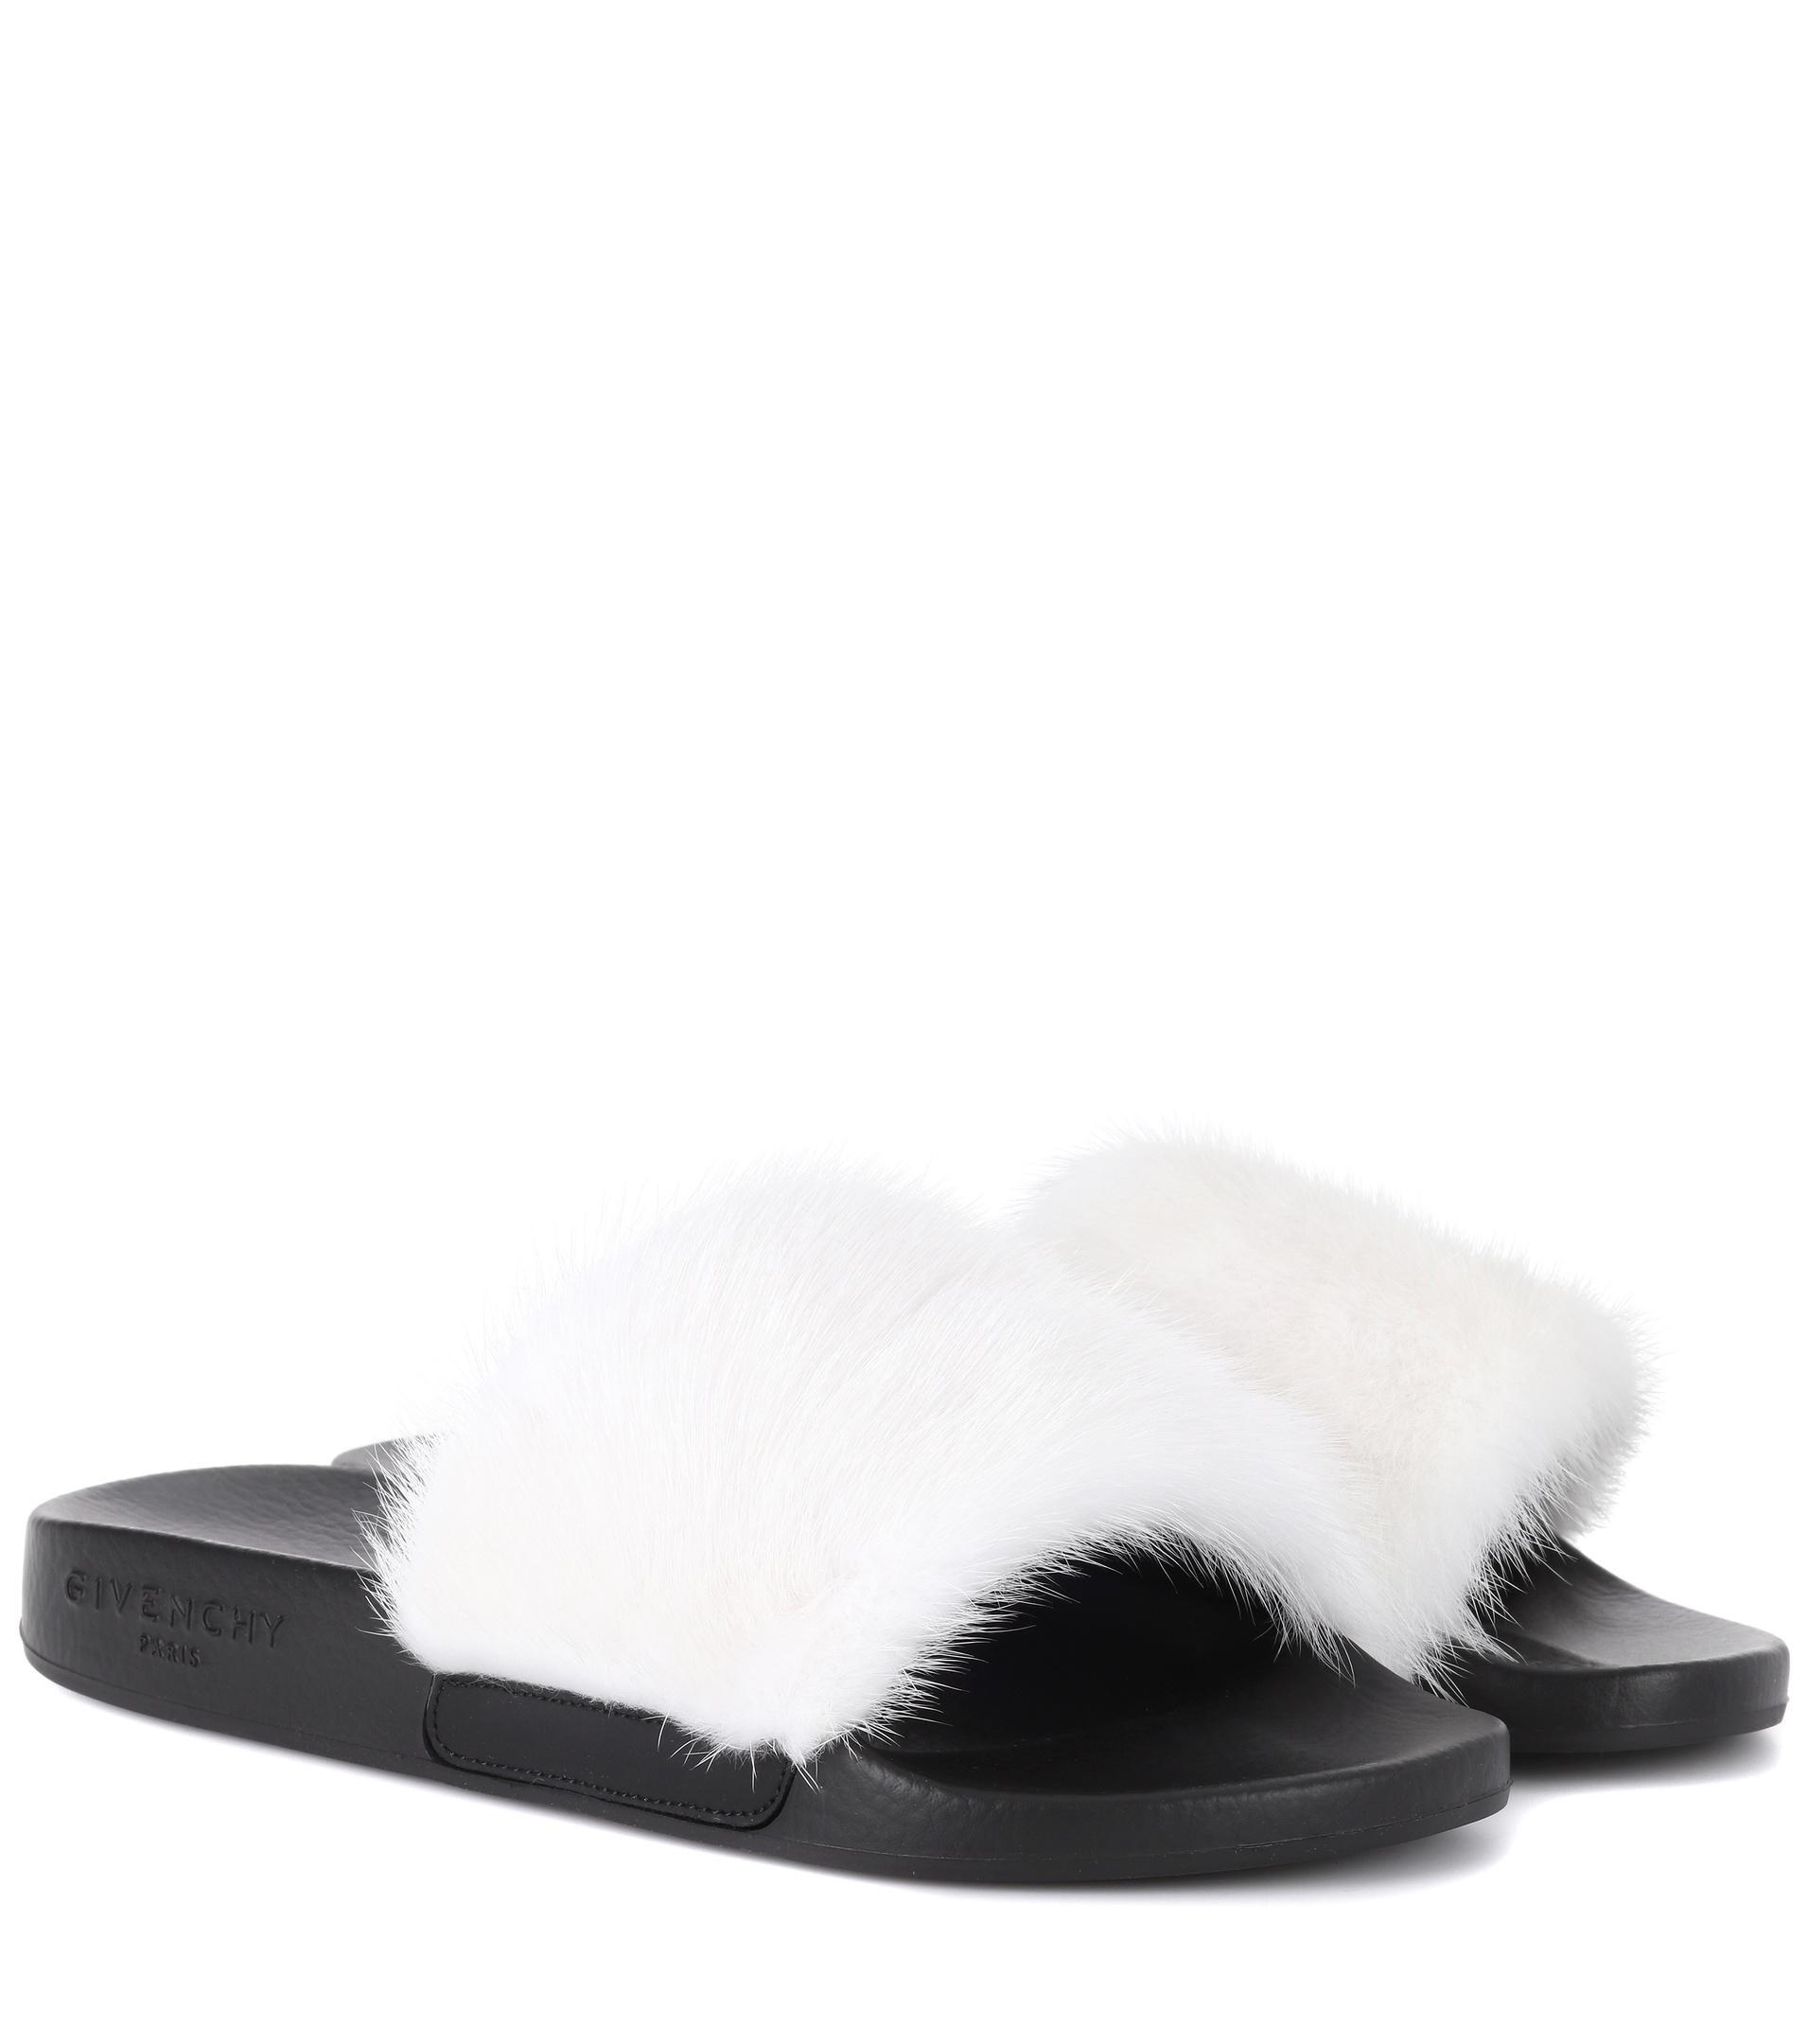 fb894ec6f45 Givenchy Mink Fur Slides in White - Save 41% - Lyst